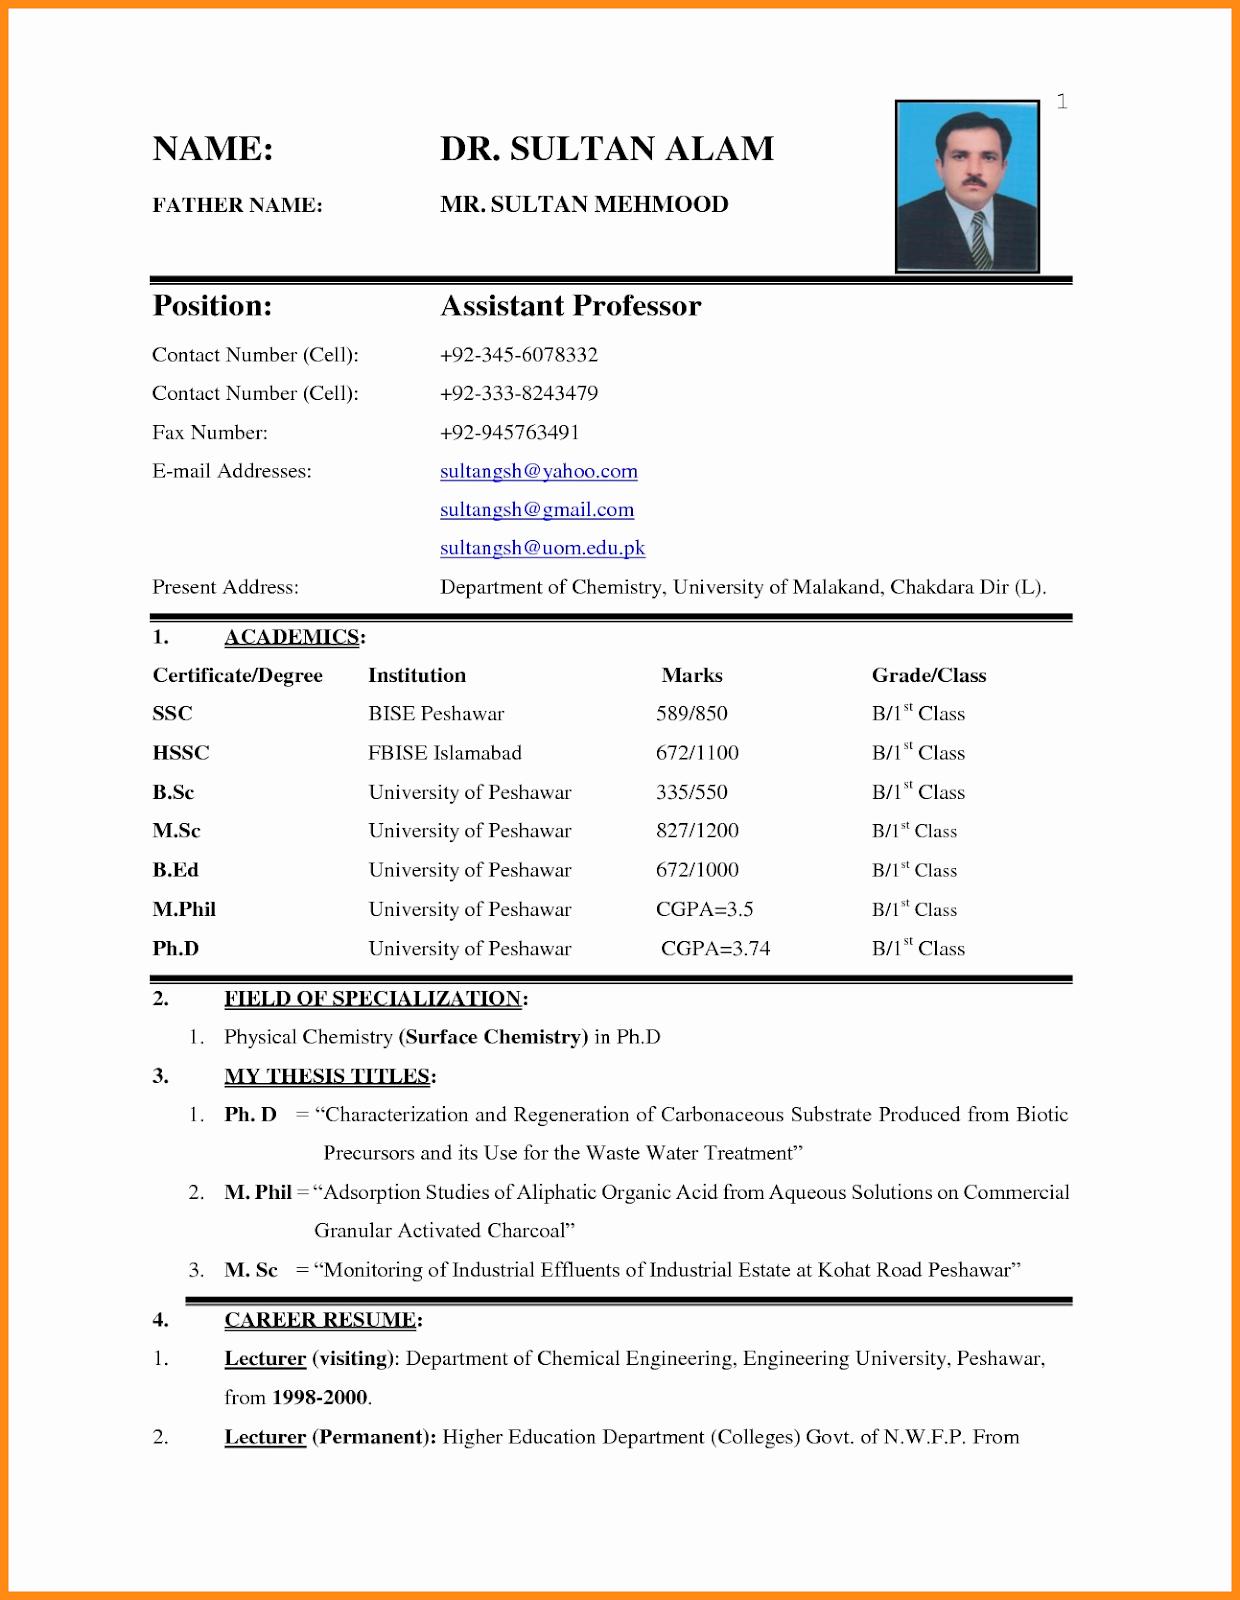 marriage biodata word format doc free download marriage biodata word format doc free download in tamil marriage biodata word format doc free download in marathi marriage biodata word format doc